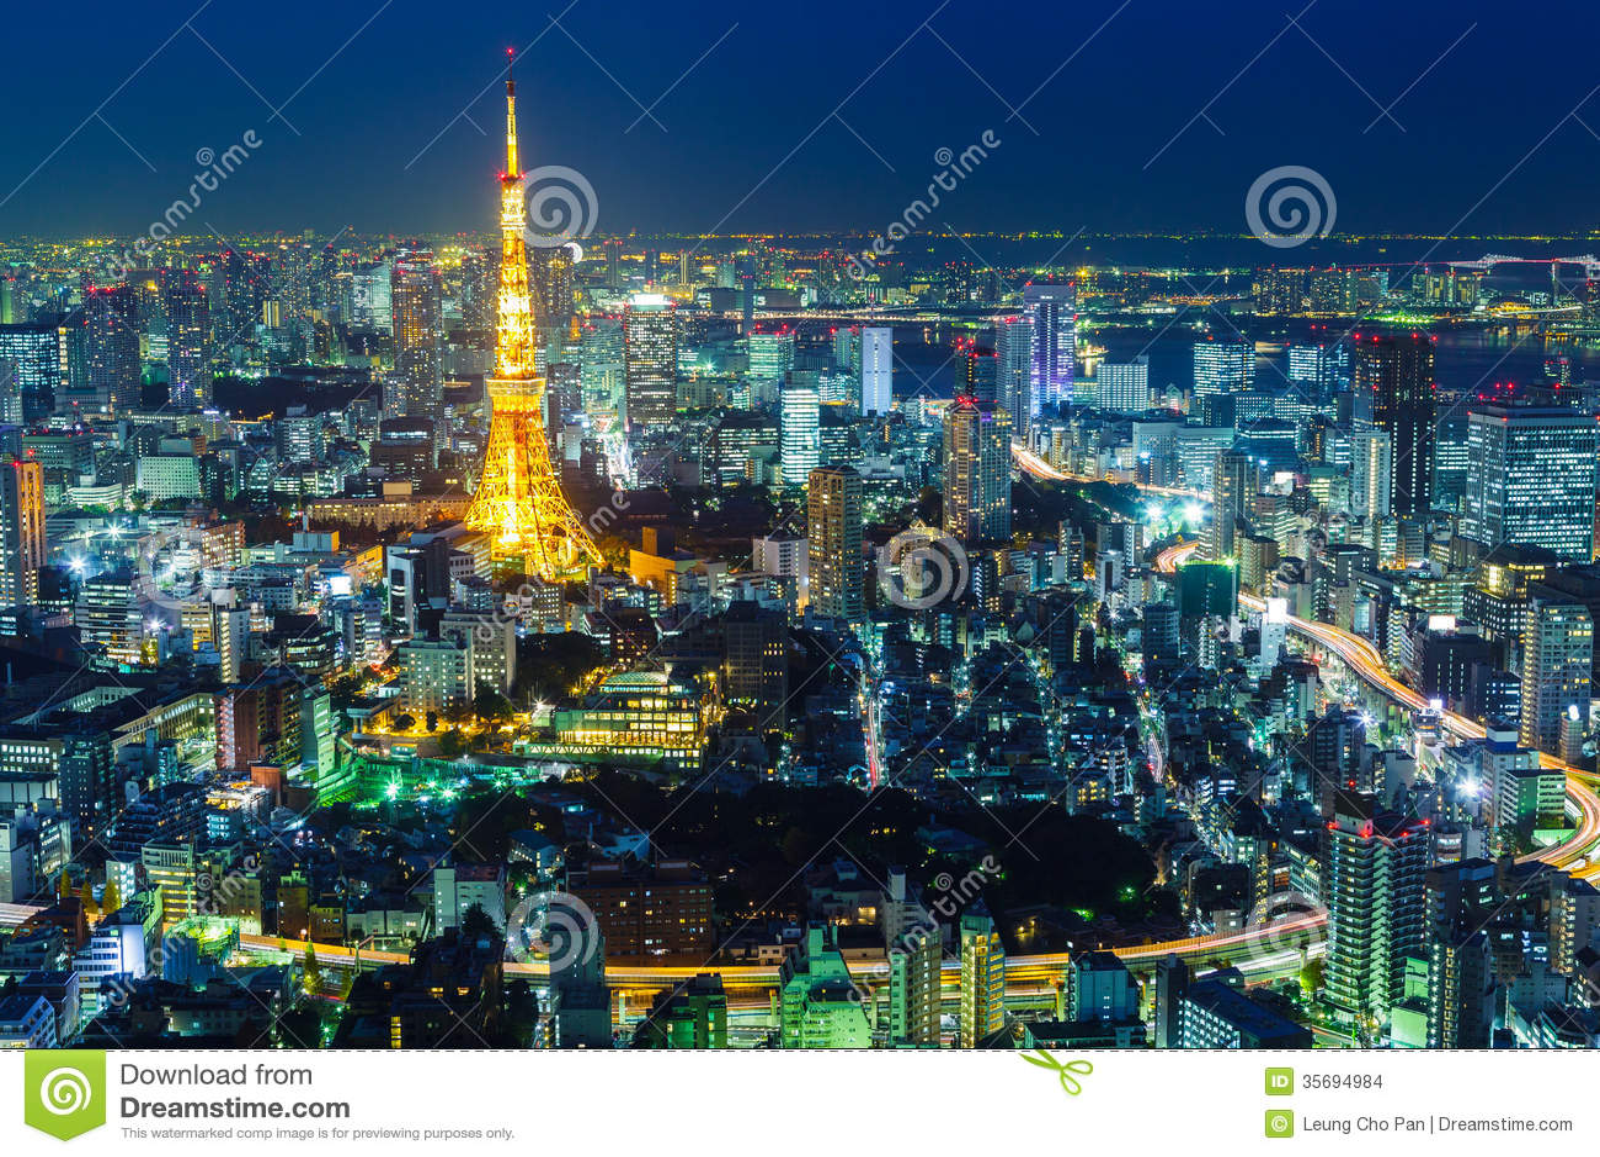 tokyo dark city skyline - photo #17